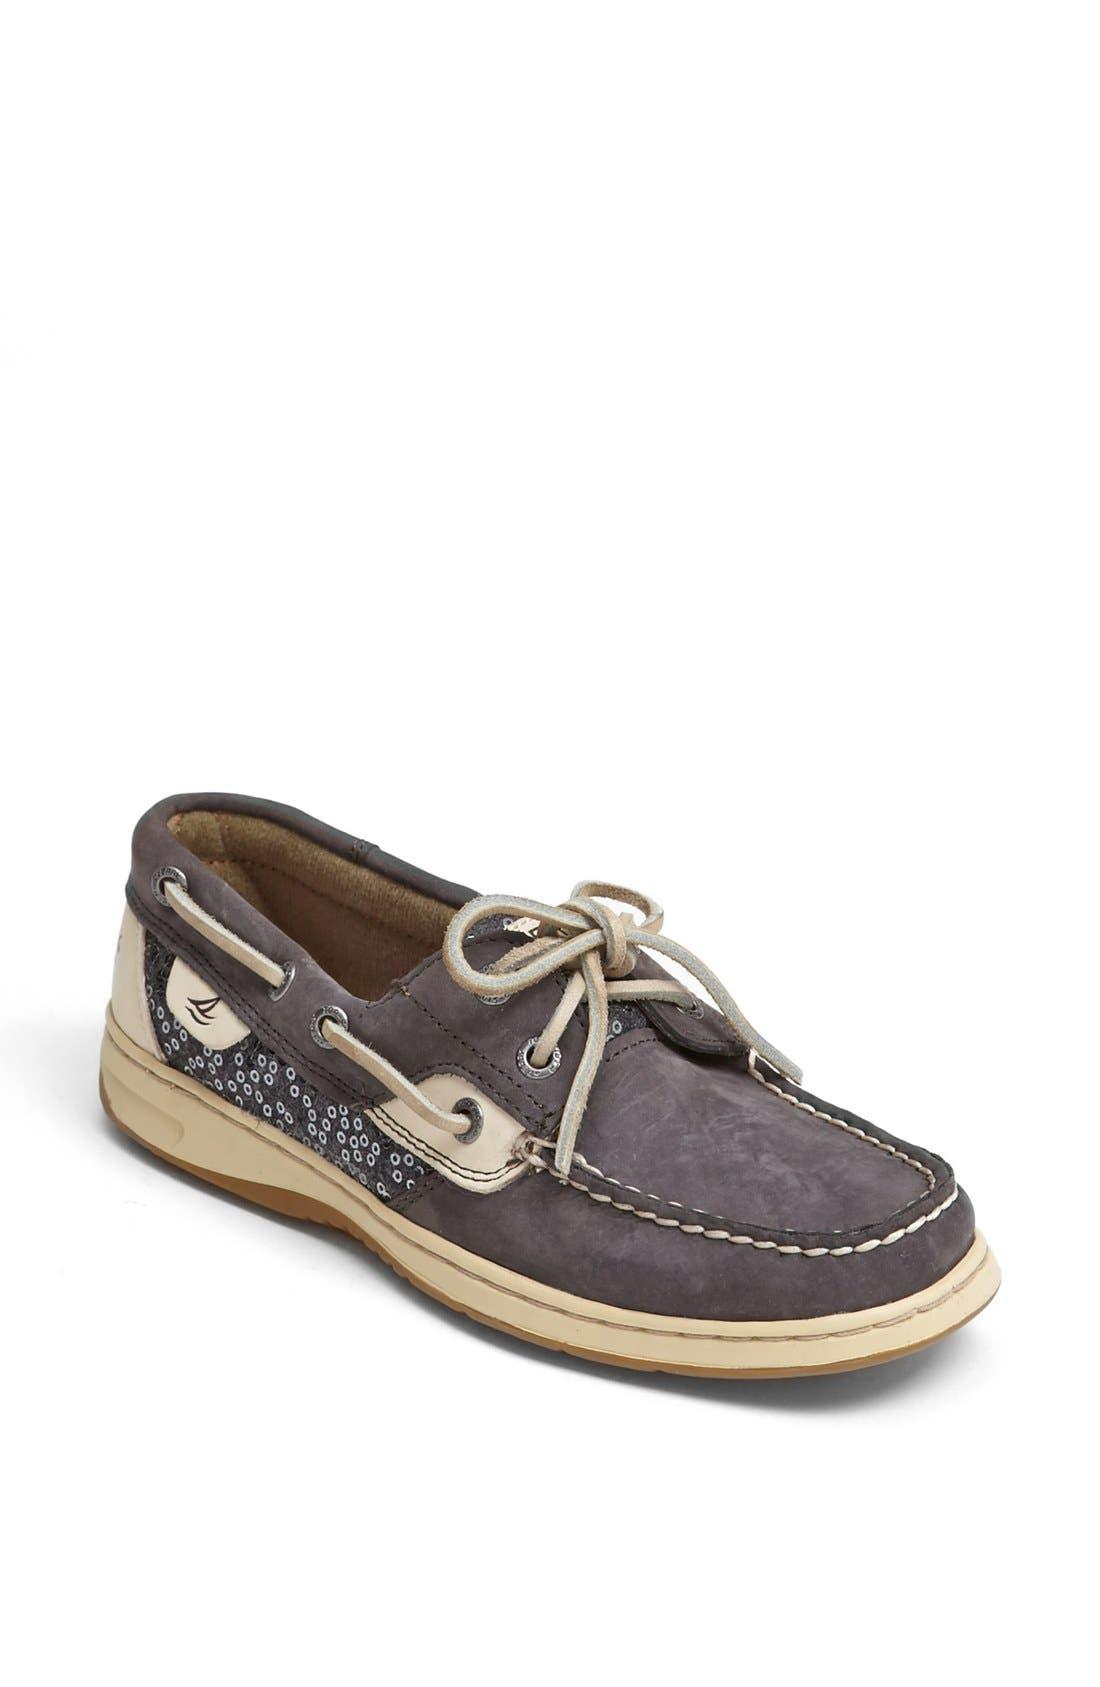 Alternate Image 1 Selected - Sperry Top-Sider® 'Bluefish 2-Eye' Boat Shoe (Women)